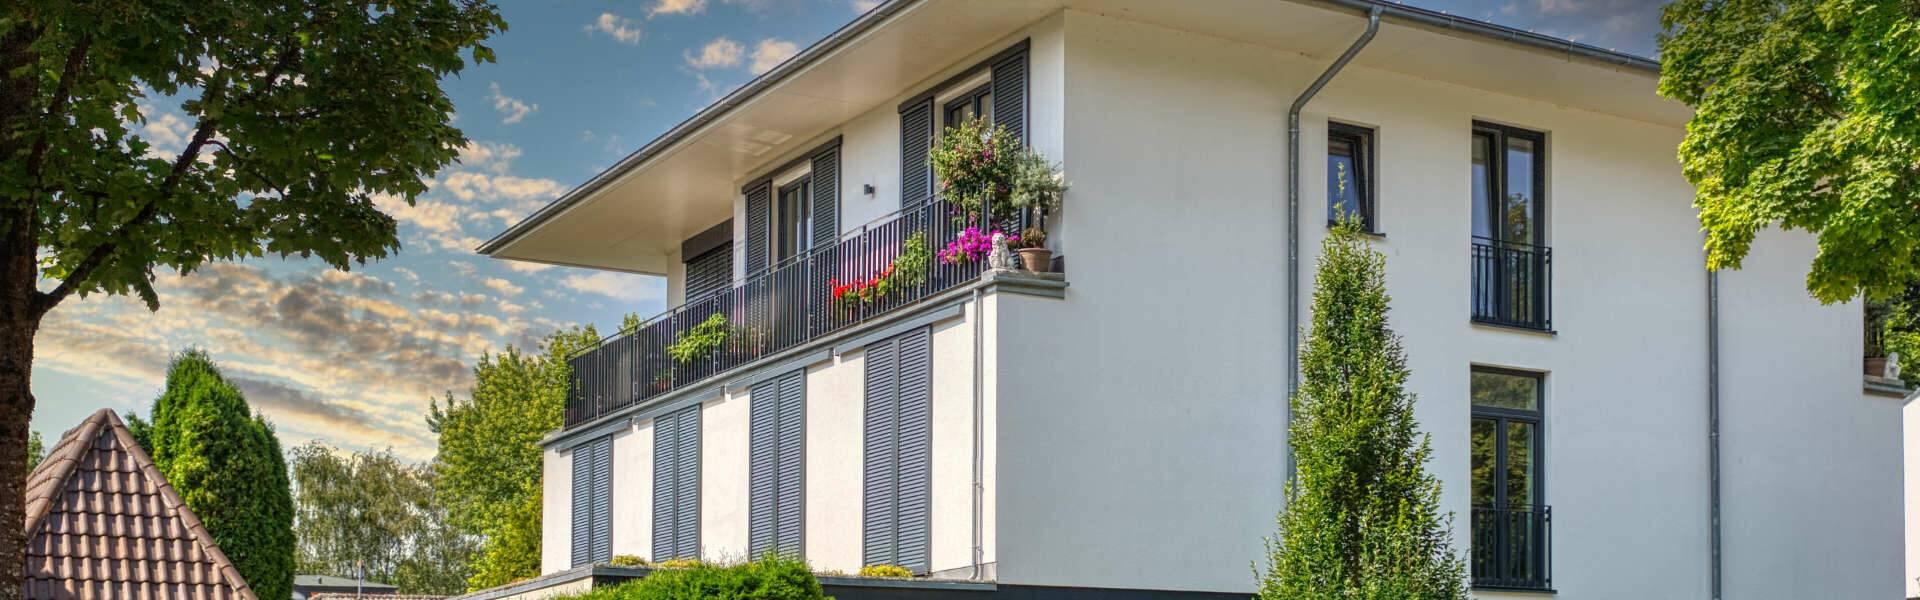 Immobilien Ratgeber Verkäufer Käufer Vermieter